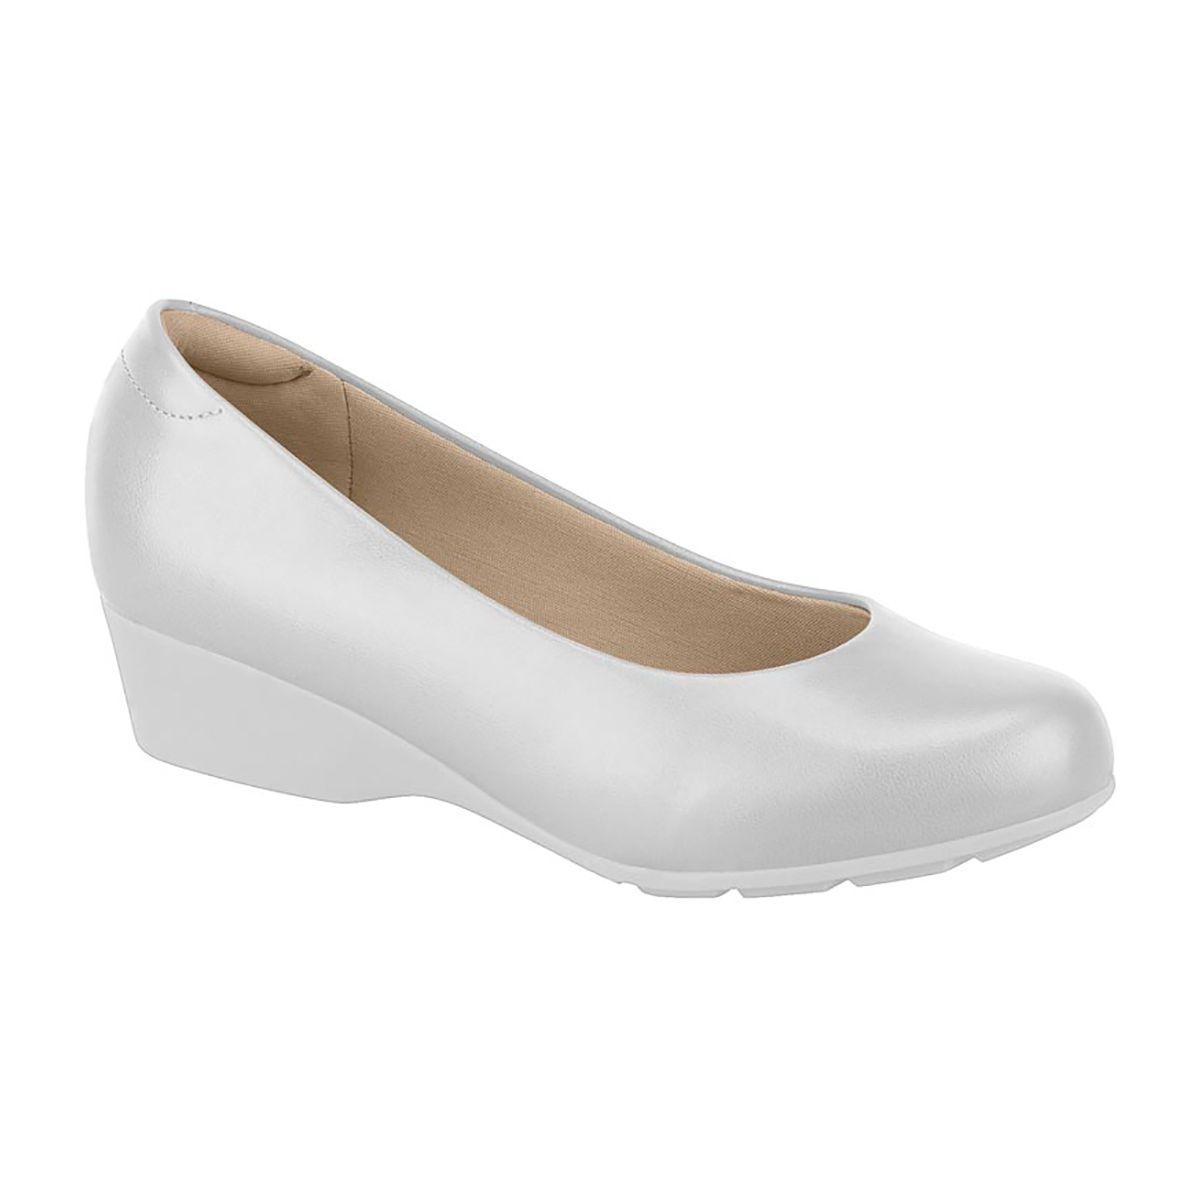 Sapato Feminino Anabela Fechado Modare 7014.200